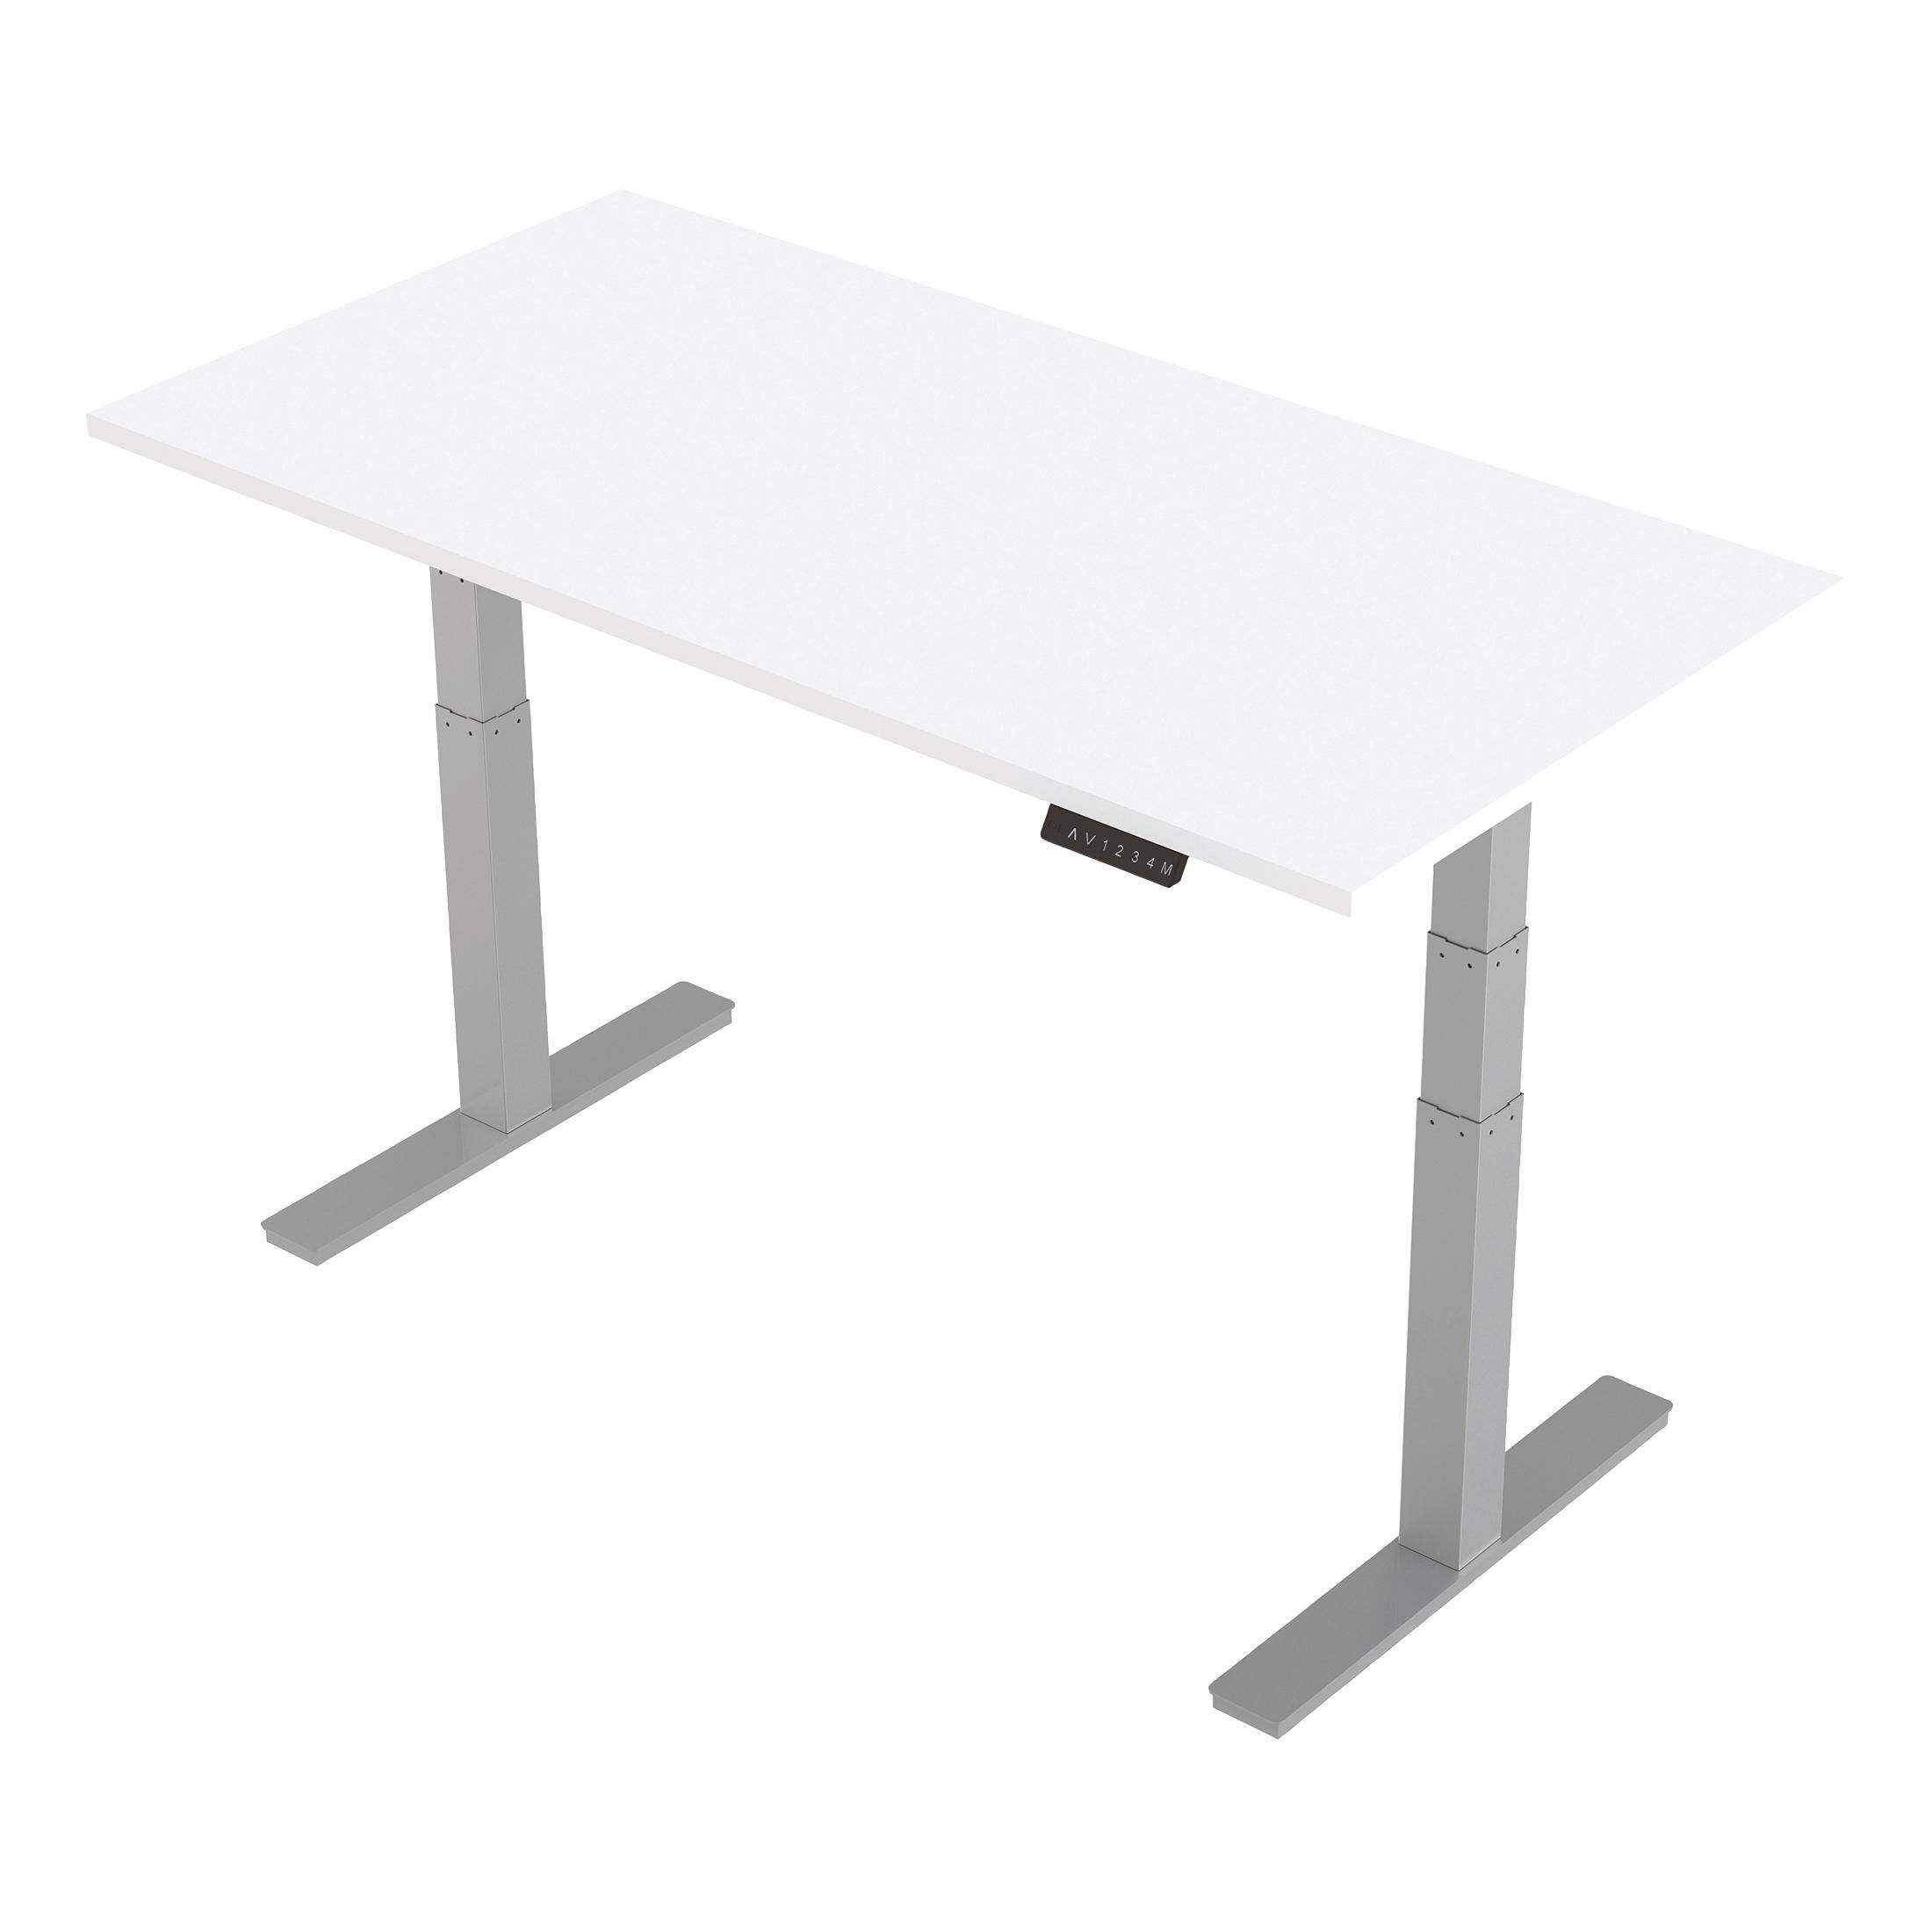 Trexus Sit-Stand Desk Height-adjustable Silver Leg Frame 1600/800mm White Ref HA01011